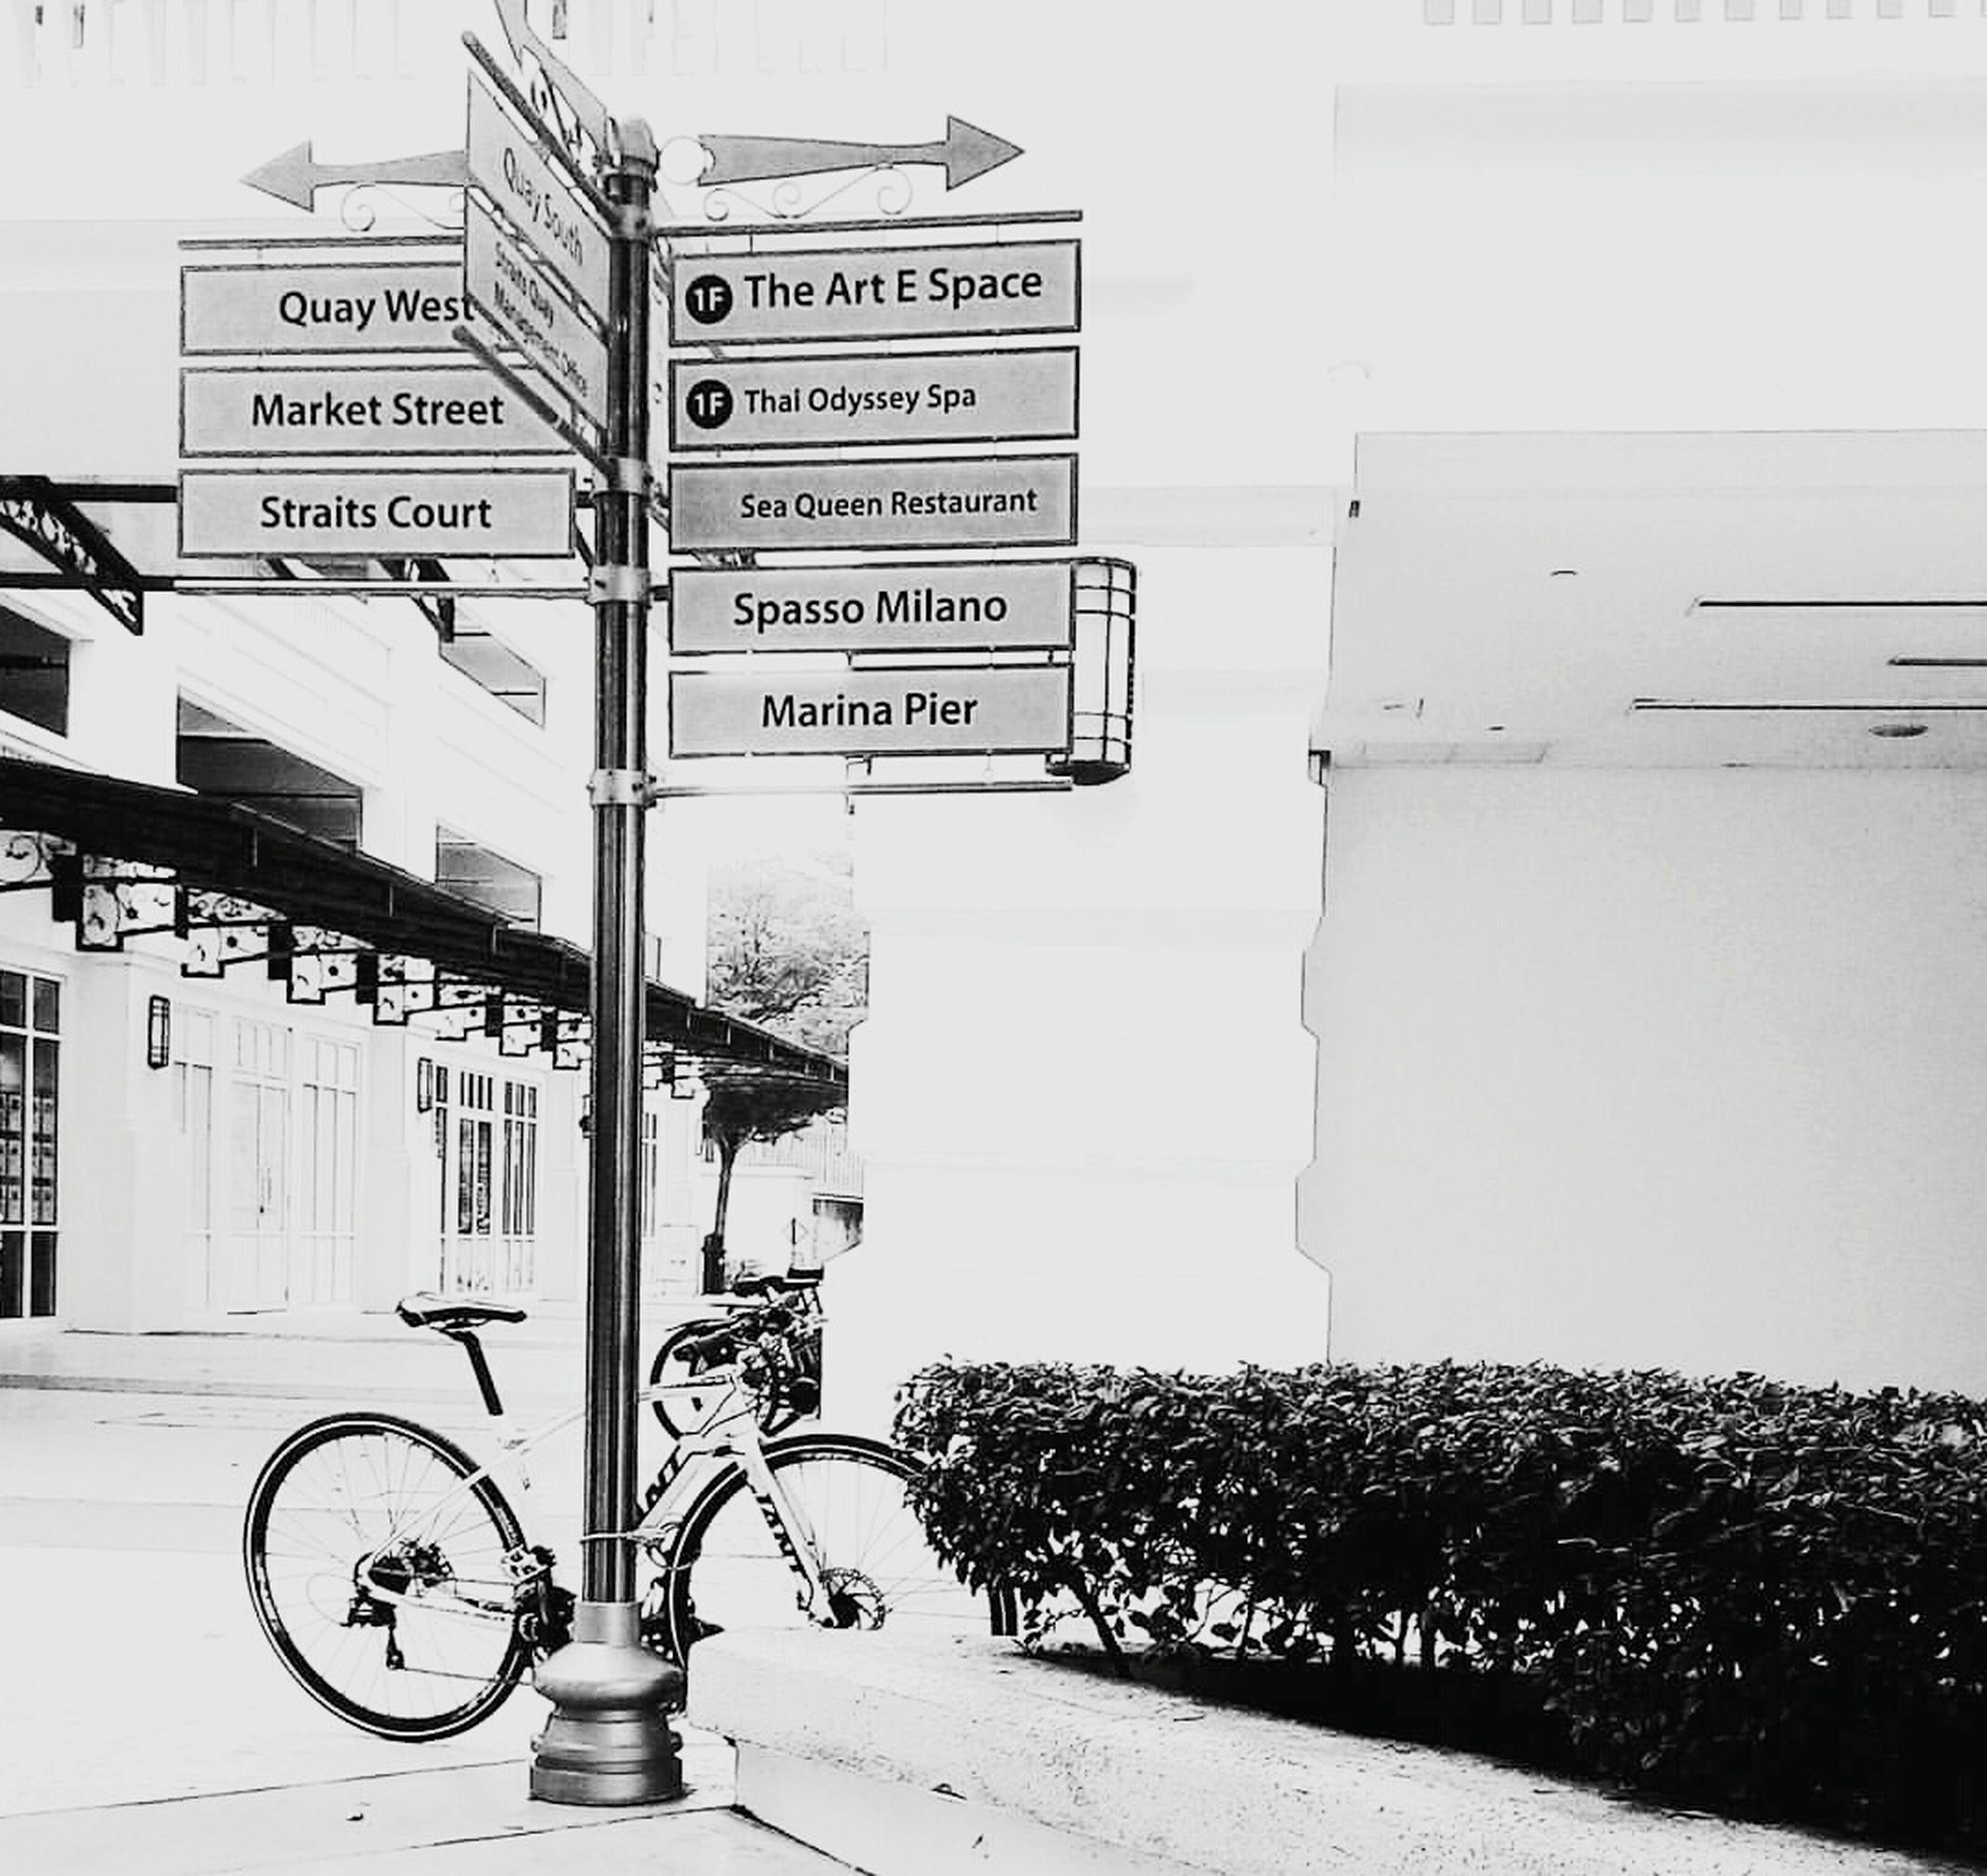 EyeEm Best Shots Penang Straits Quay Cycling Giantbicycle The Art E Space Thai Odyssey Spa Sea Queen Restaurant Spasso Milano Marina Pier